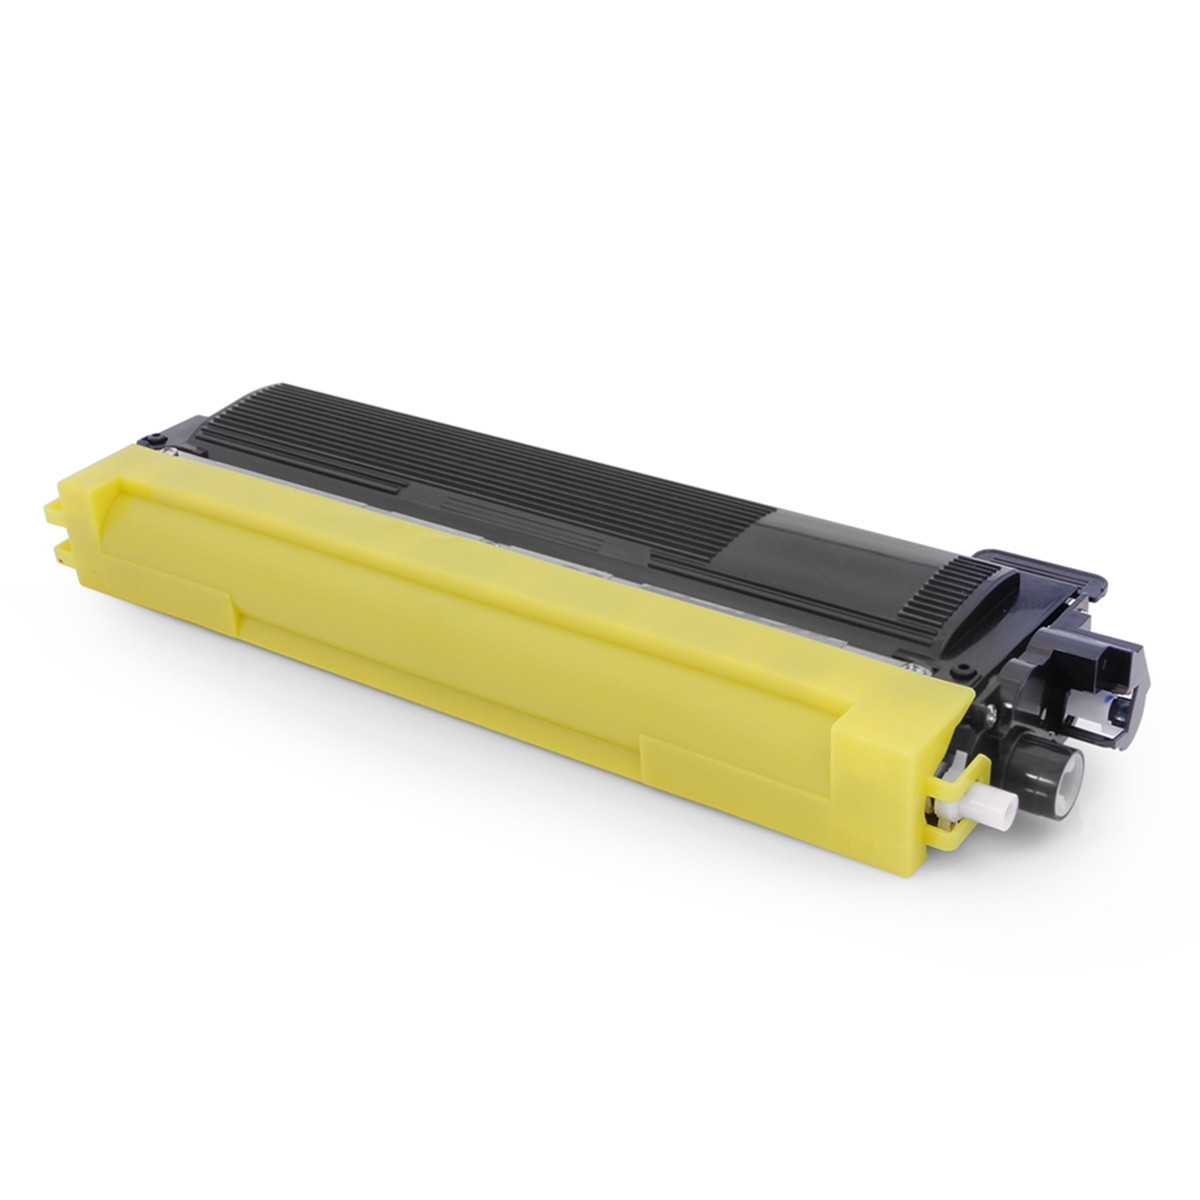 Toner Compatível com Brother TN230 TN230M Magenta | MFC9010CN MFC9320CW HL3040CN | Premium 1.4k